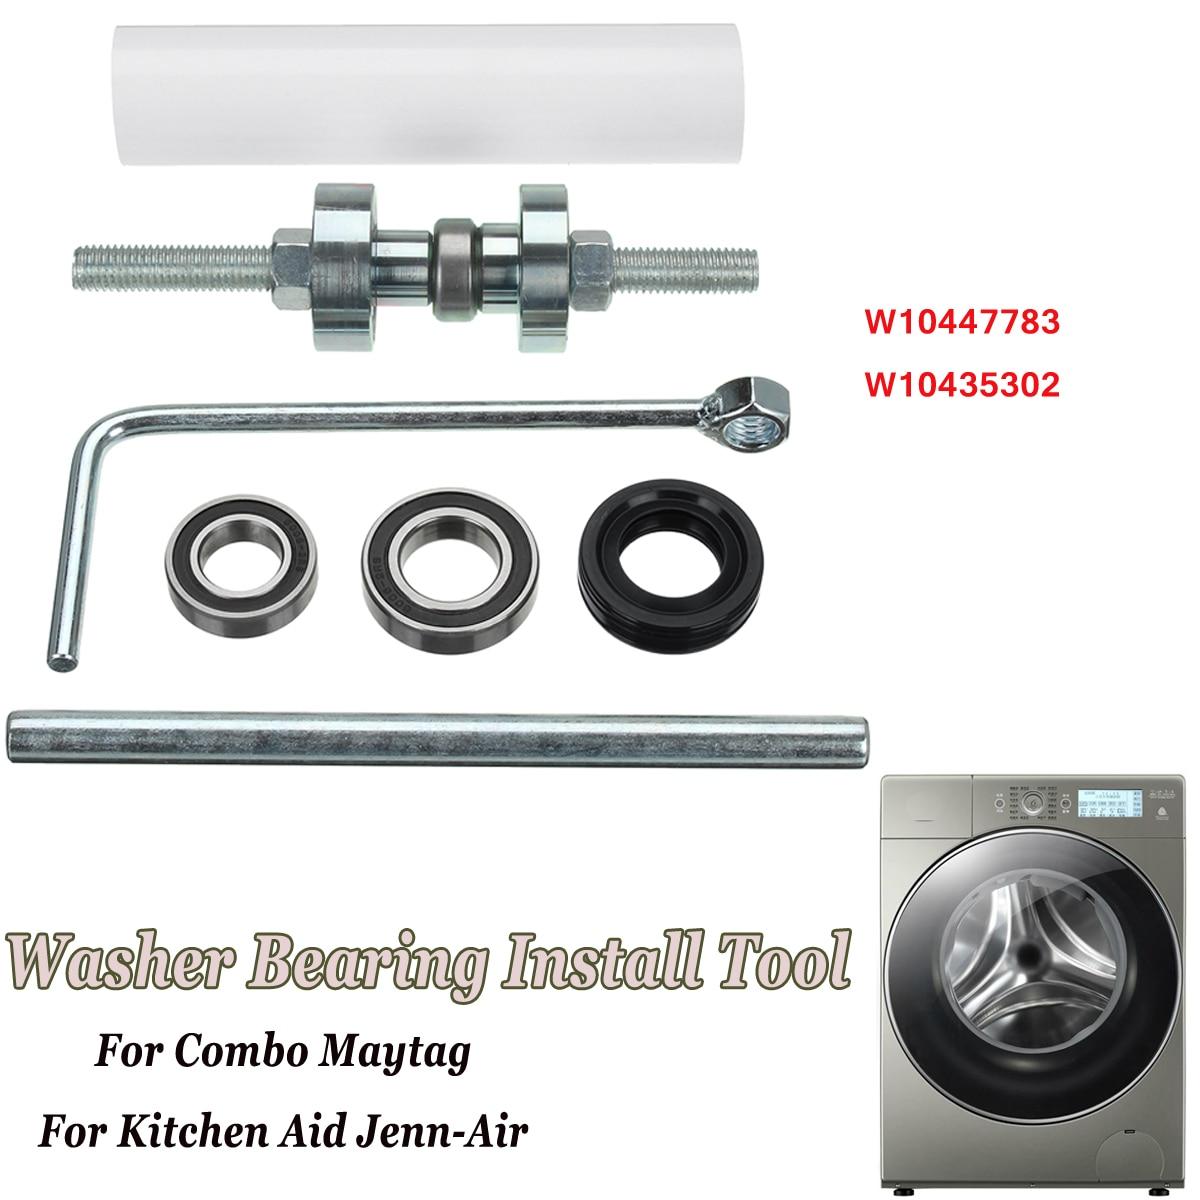 W10447783 W10435302 Bearing Install Tool For Whirlpool Kenmore Cabrio Bravo Washing Machine PartsW10447783 W10435302 Bearing Install Tool For Whirlpool Kenmore Cabrio Bravo Washing Machine Parts